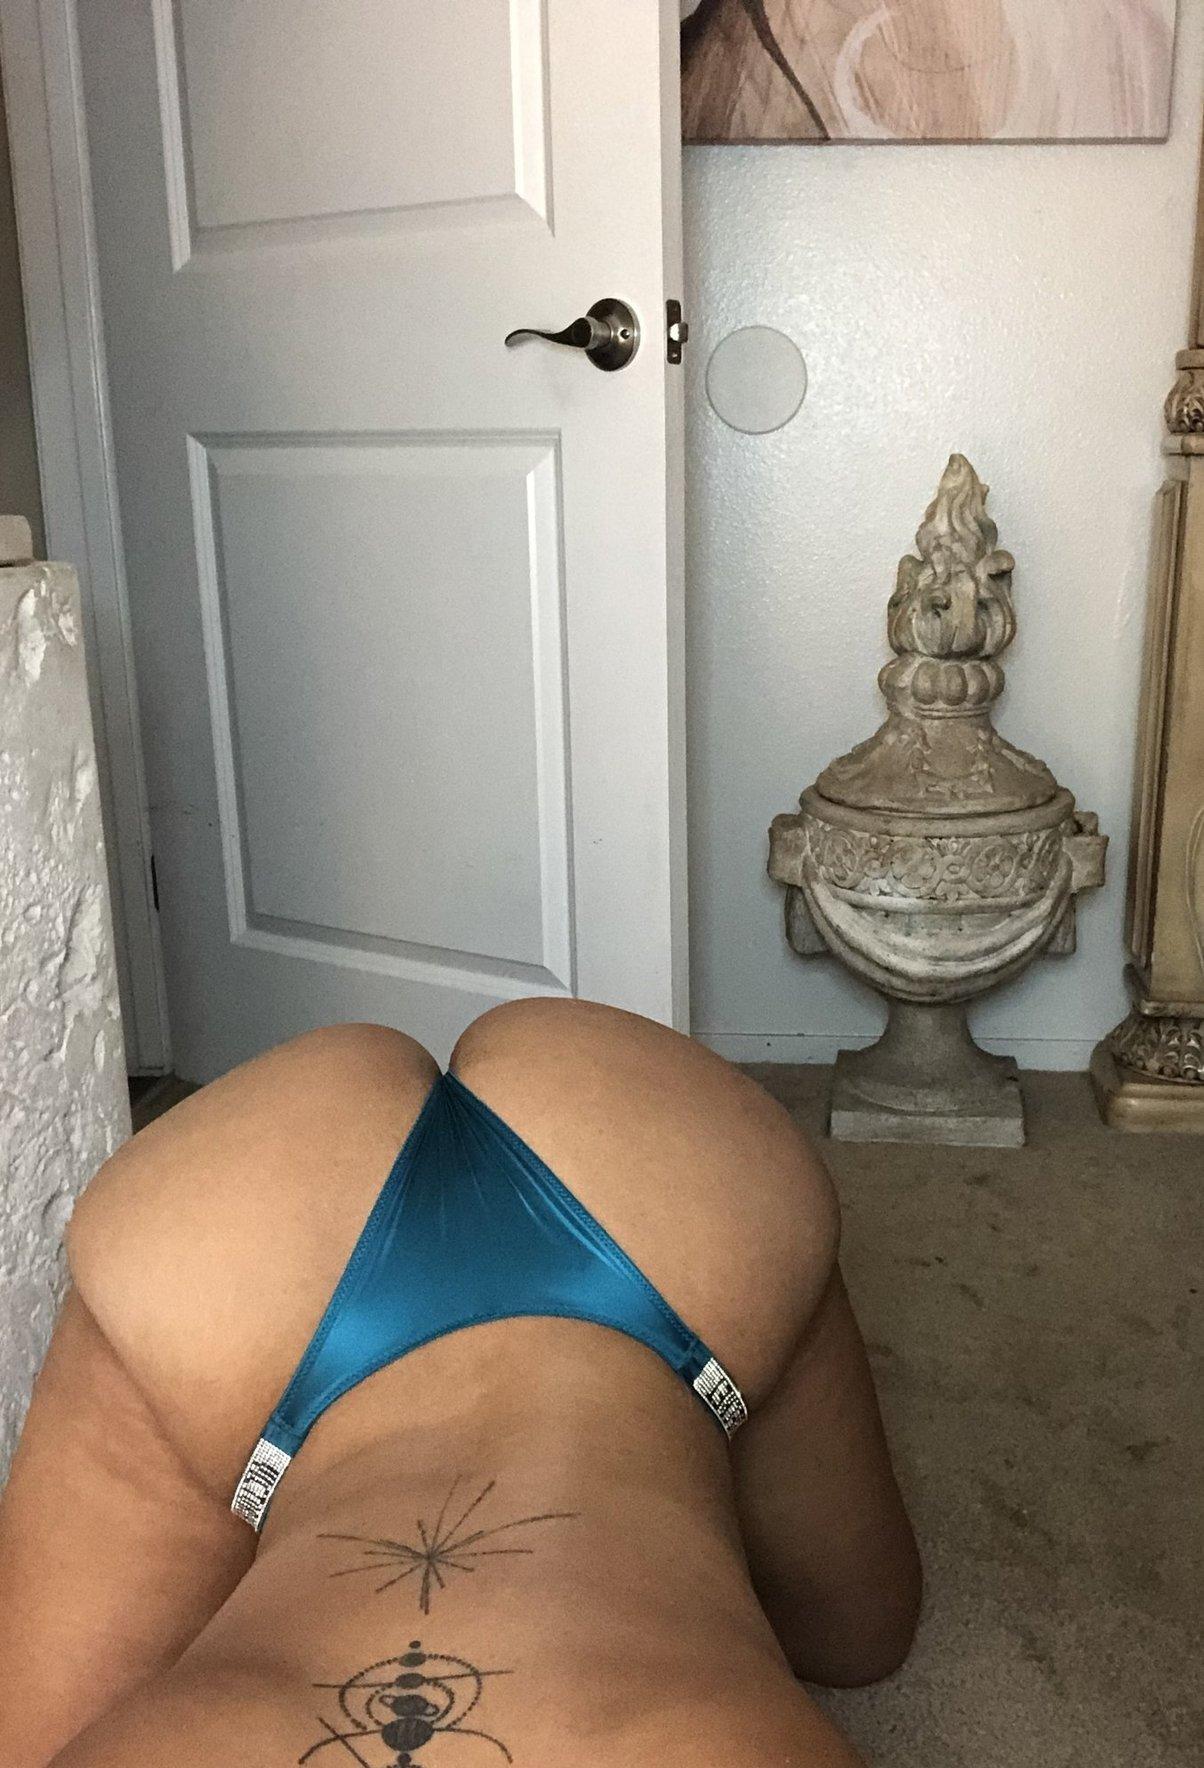 Emily Cheree Patreon Nude Leaks 0008